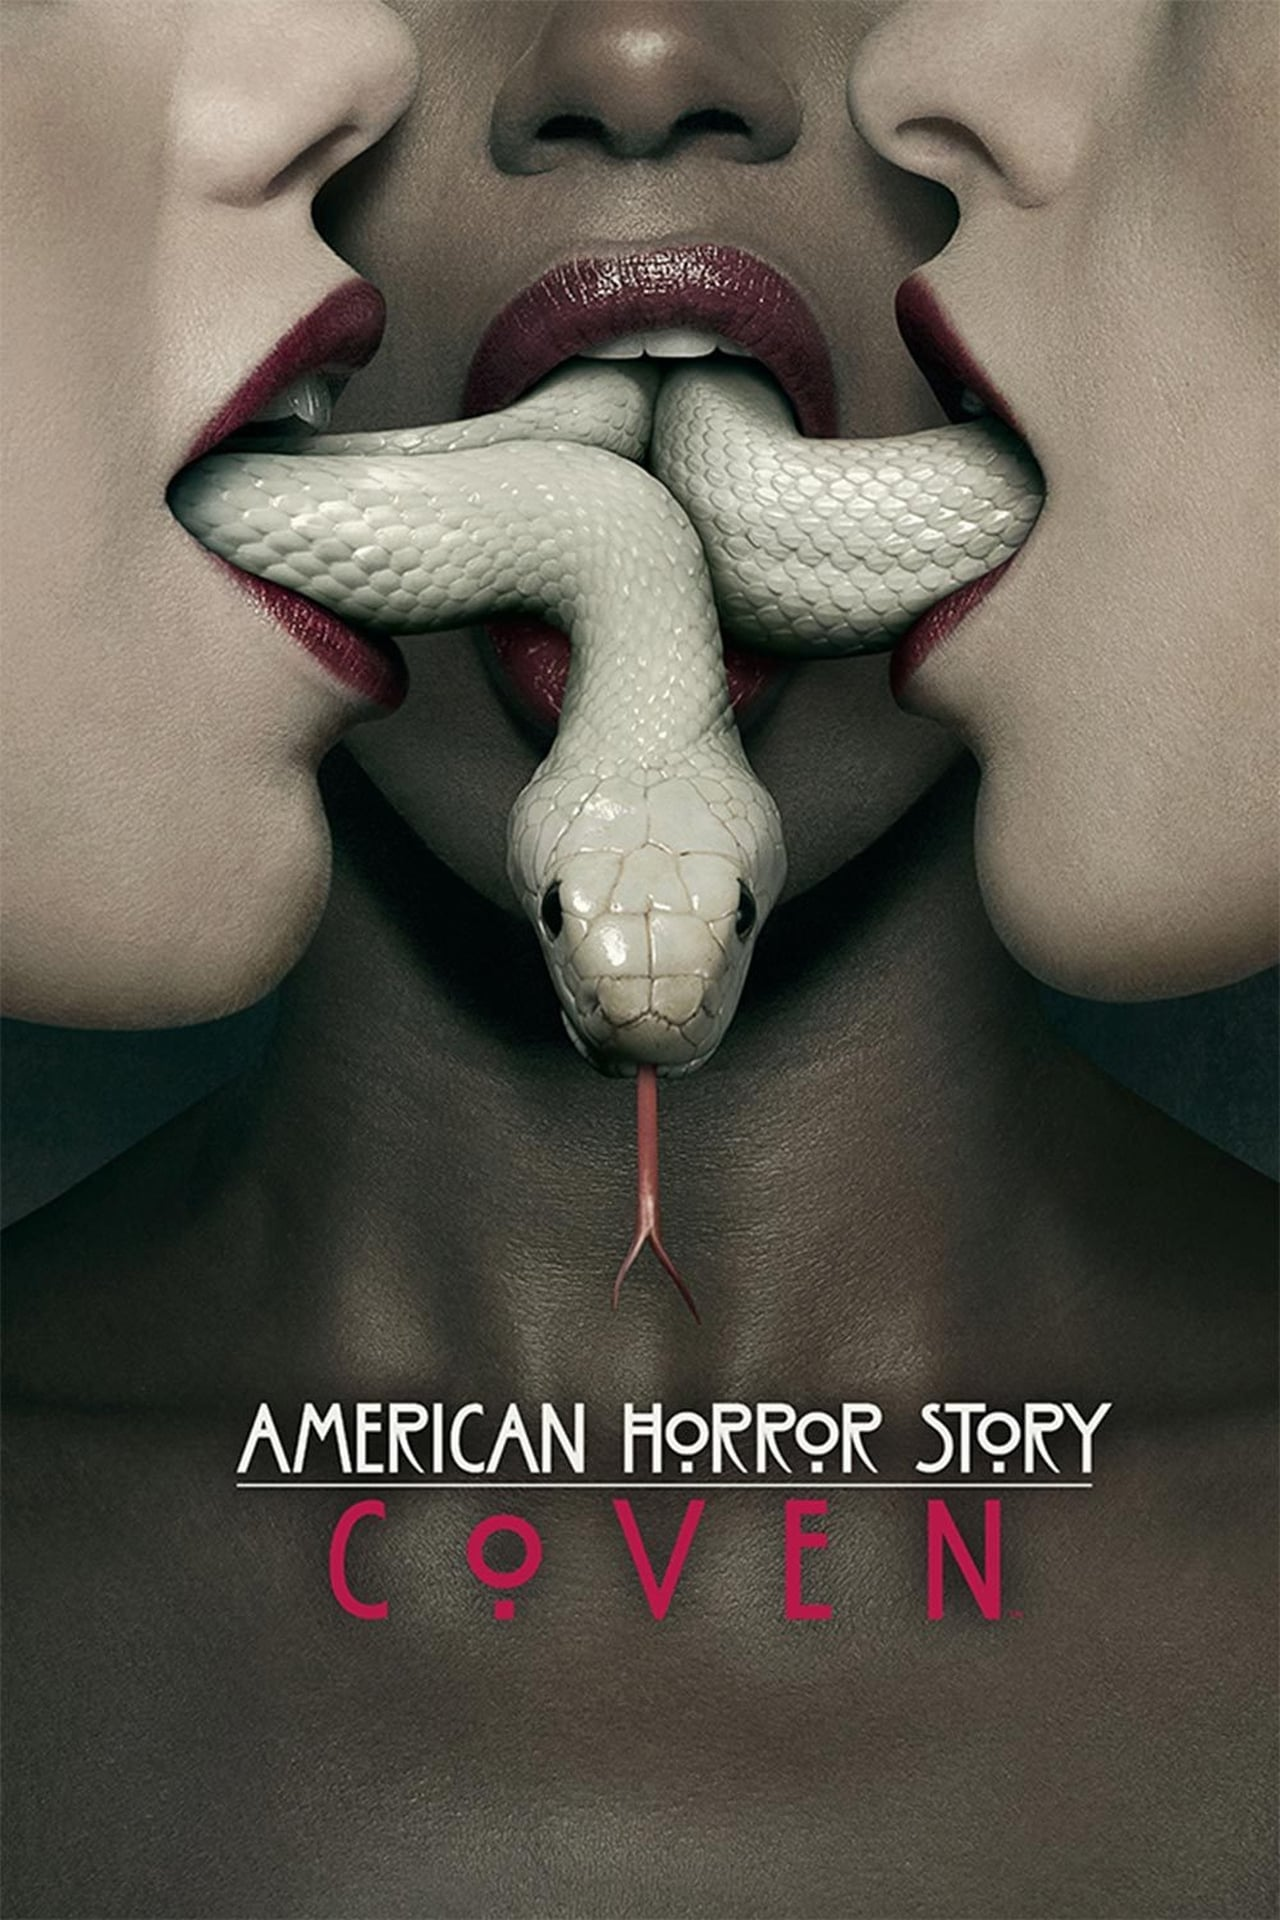 American Horror Story Season 3